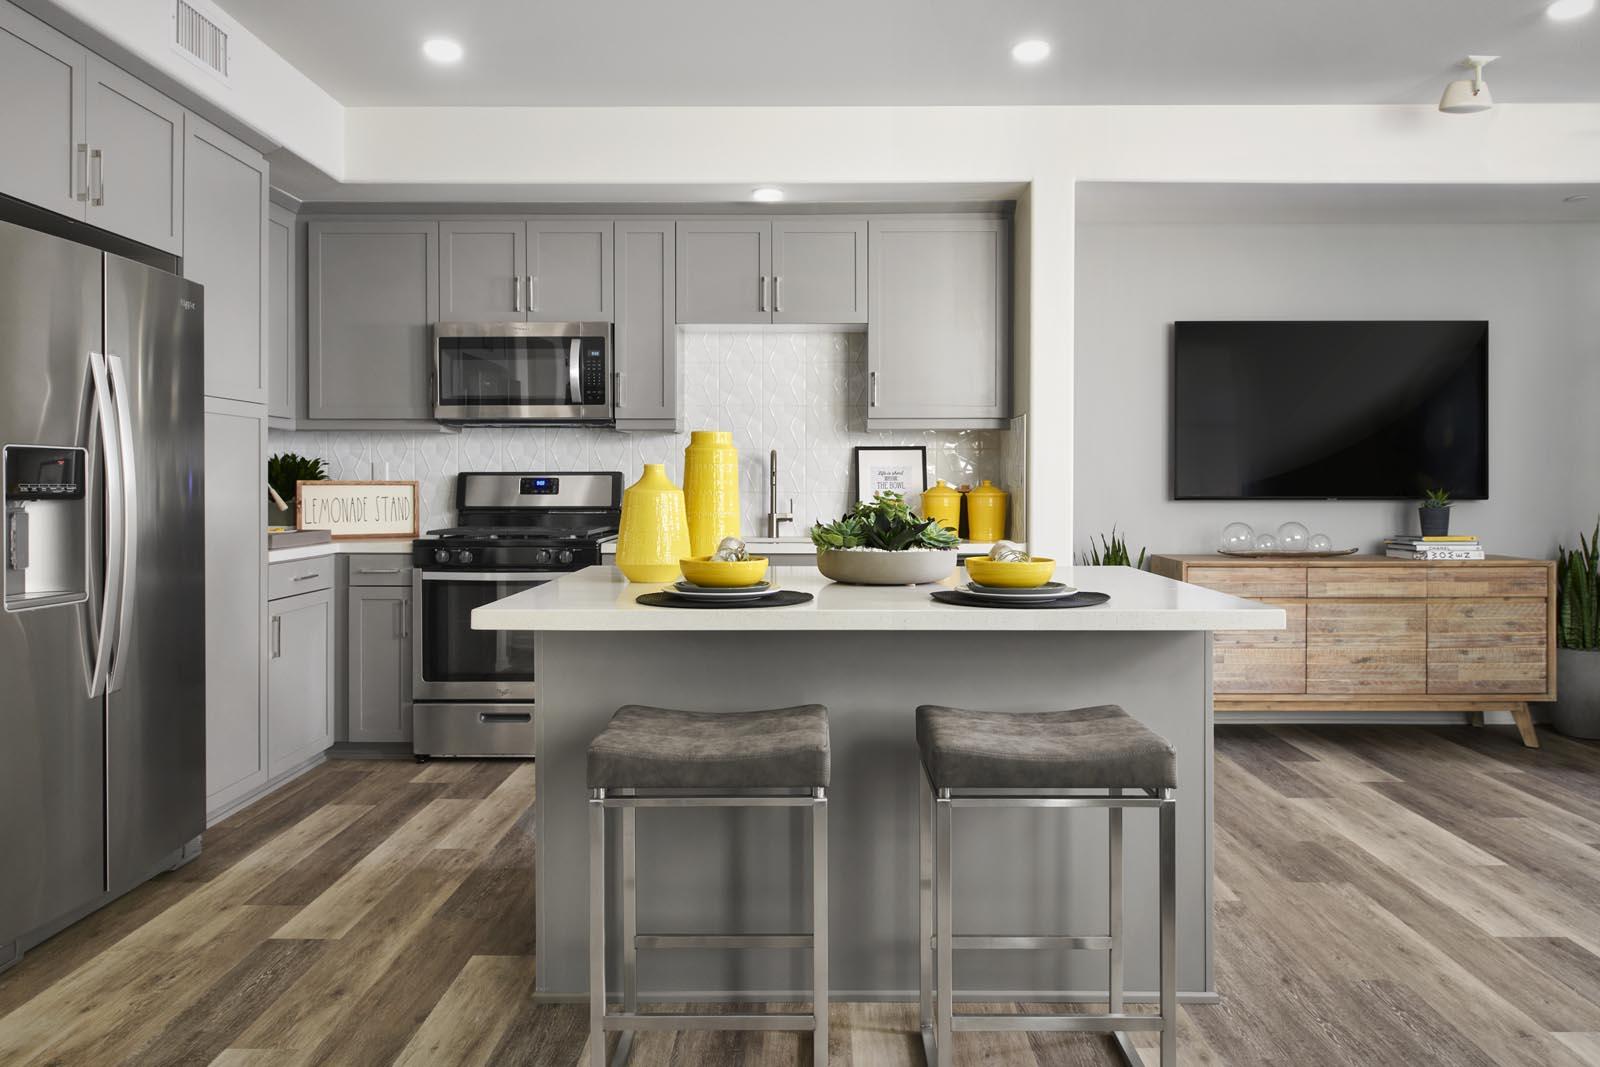 Kitchen   Residence 1   Aspire   New Homes in Rancho Cucamonga, CA   Van Daele Homes